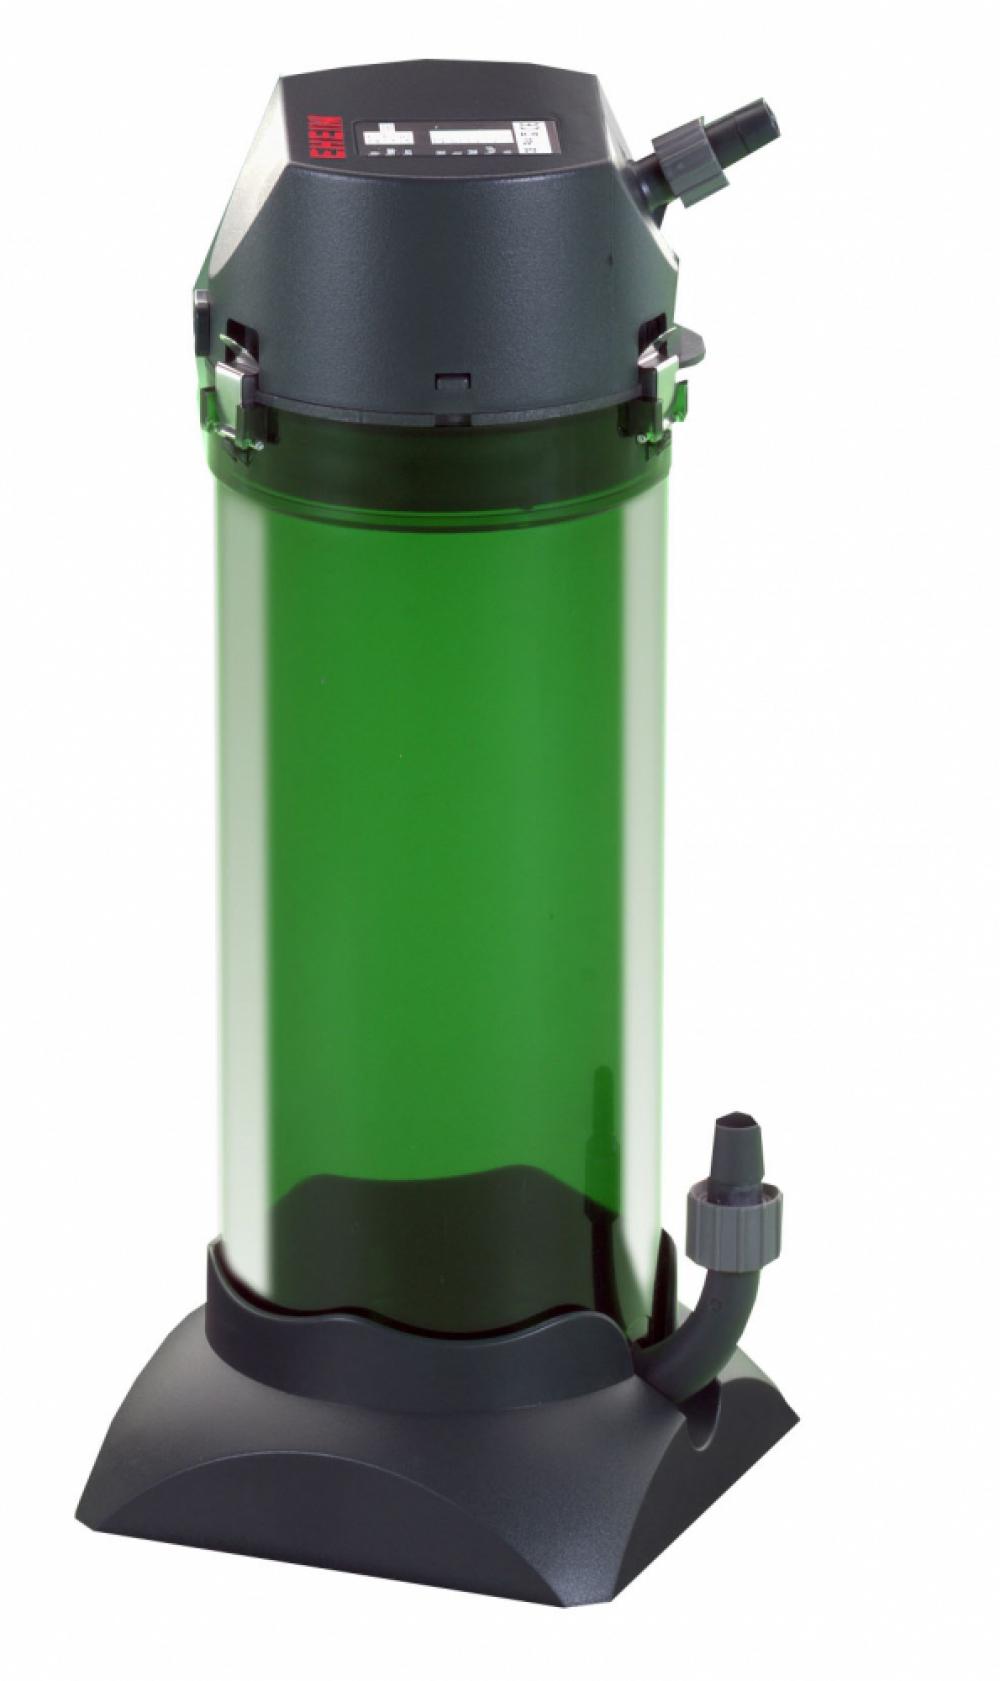 Внешний фильтр Eheim Classic 2211 (для аквариумов до 150л) - 2